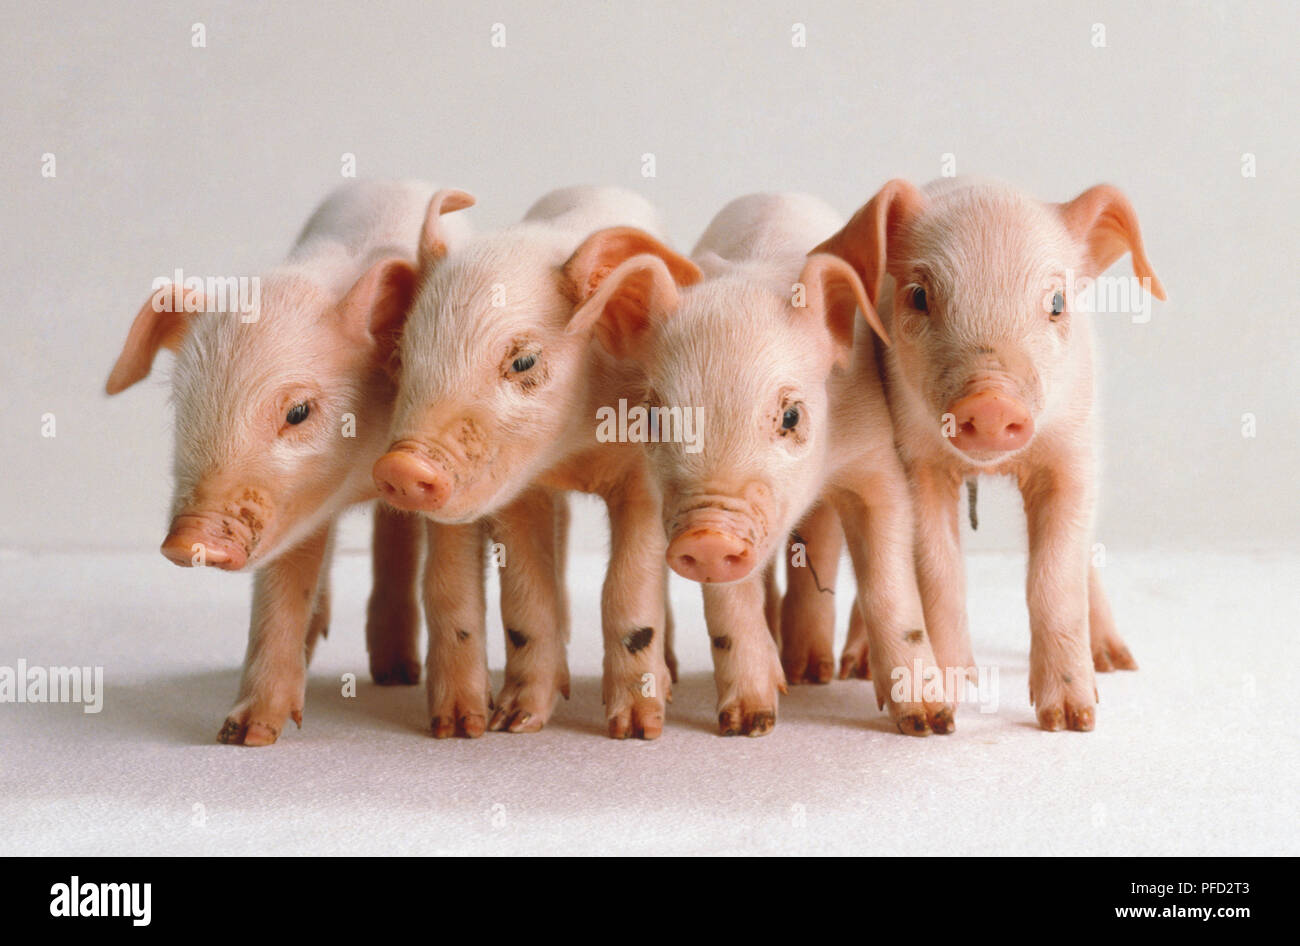 Three pink piglets. - Stock Image